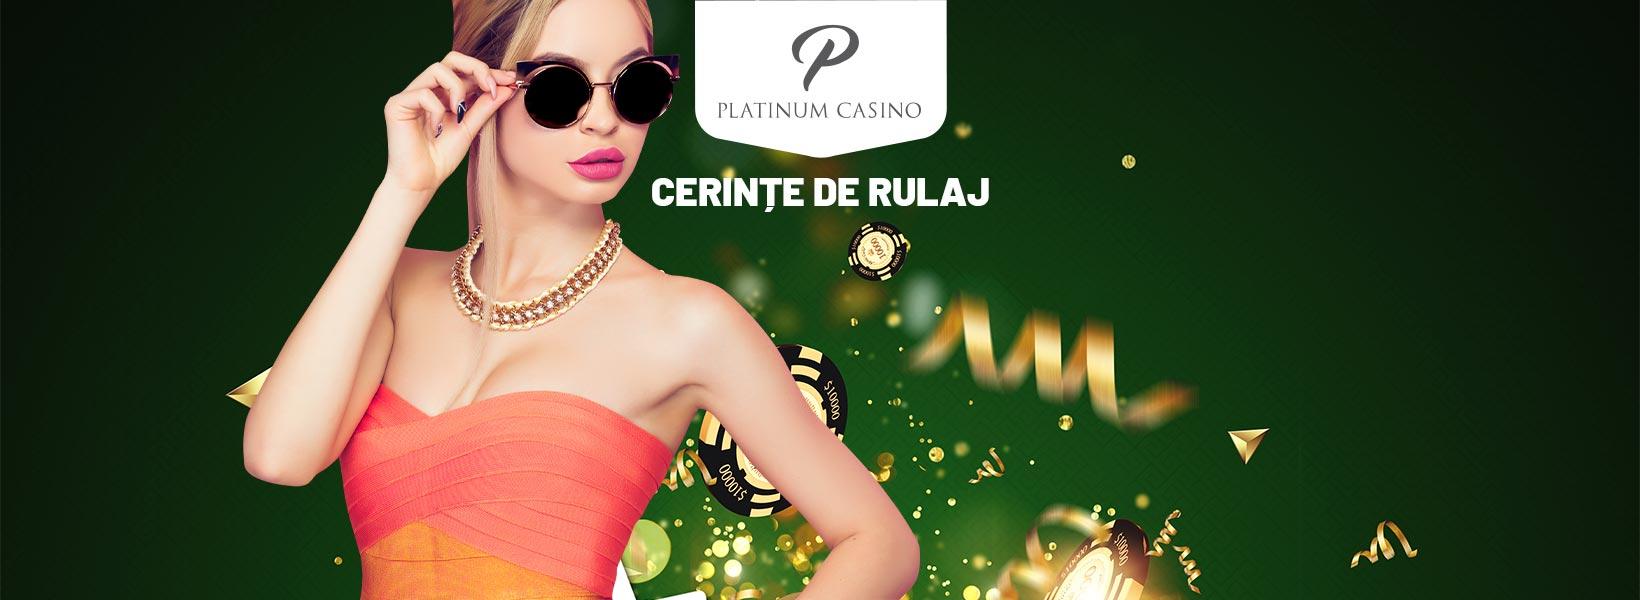 cerințe rulaj platinum casino